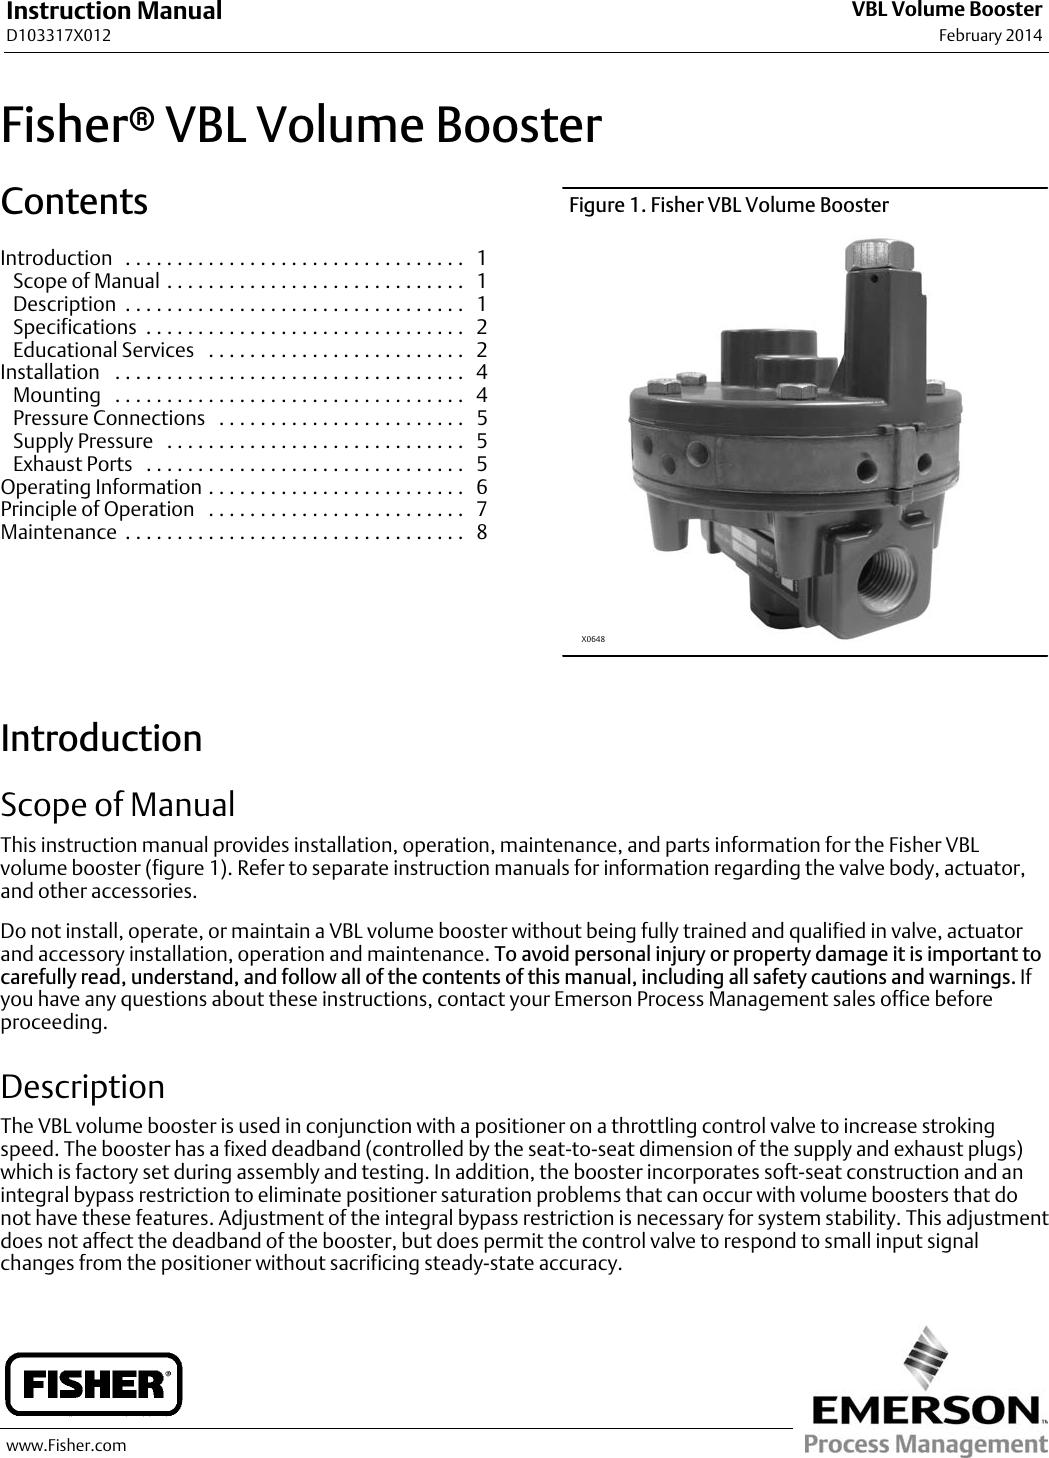 Emerson Delta V manual Pdf